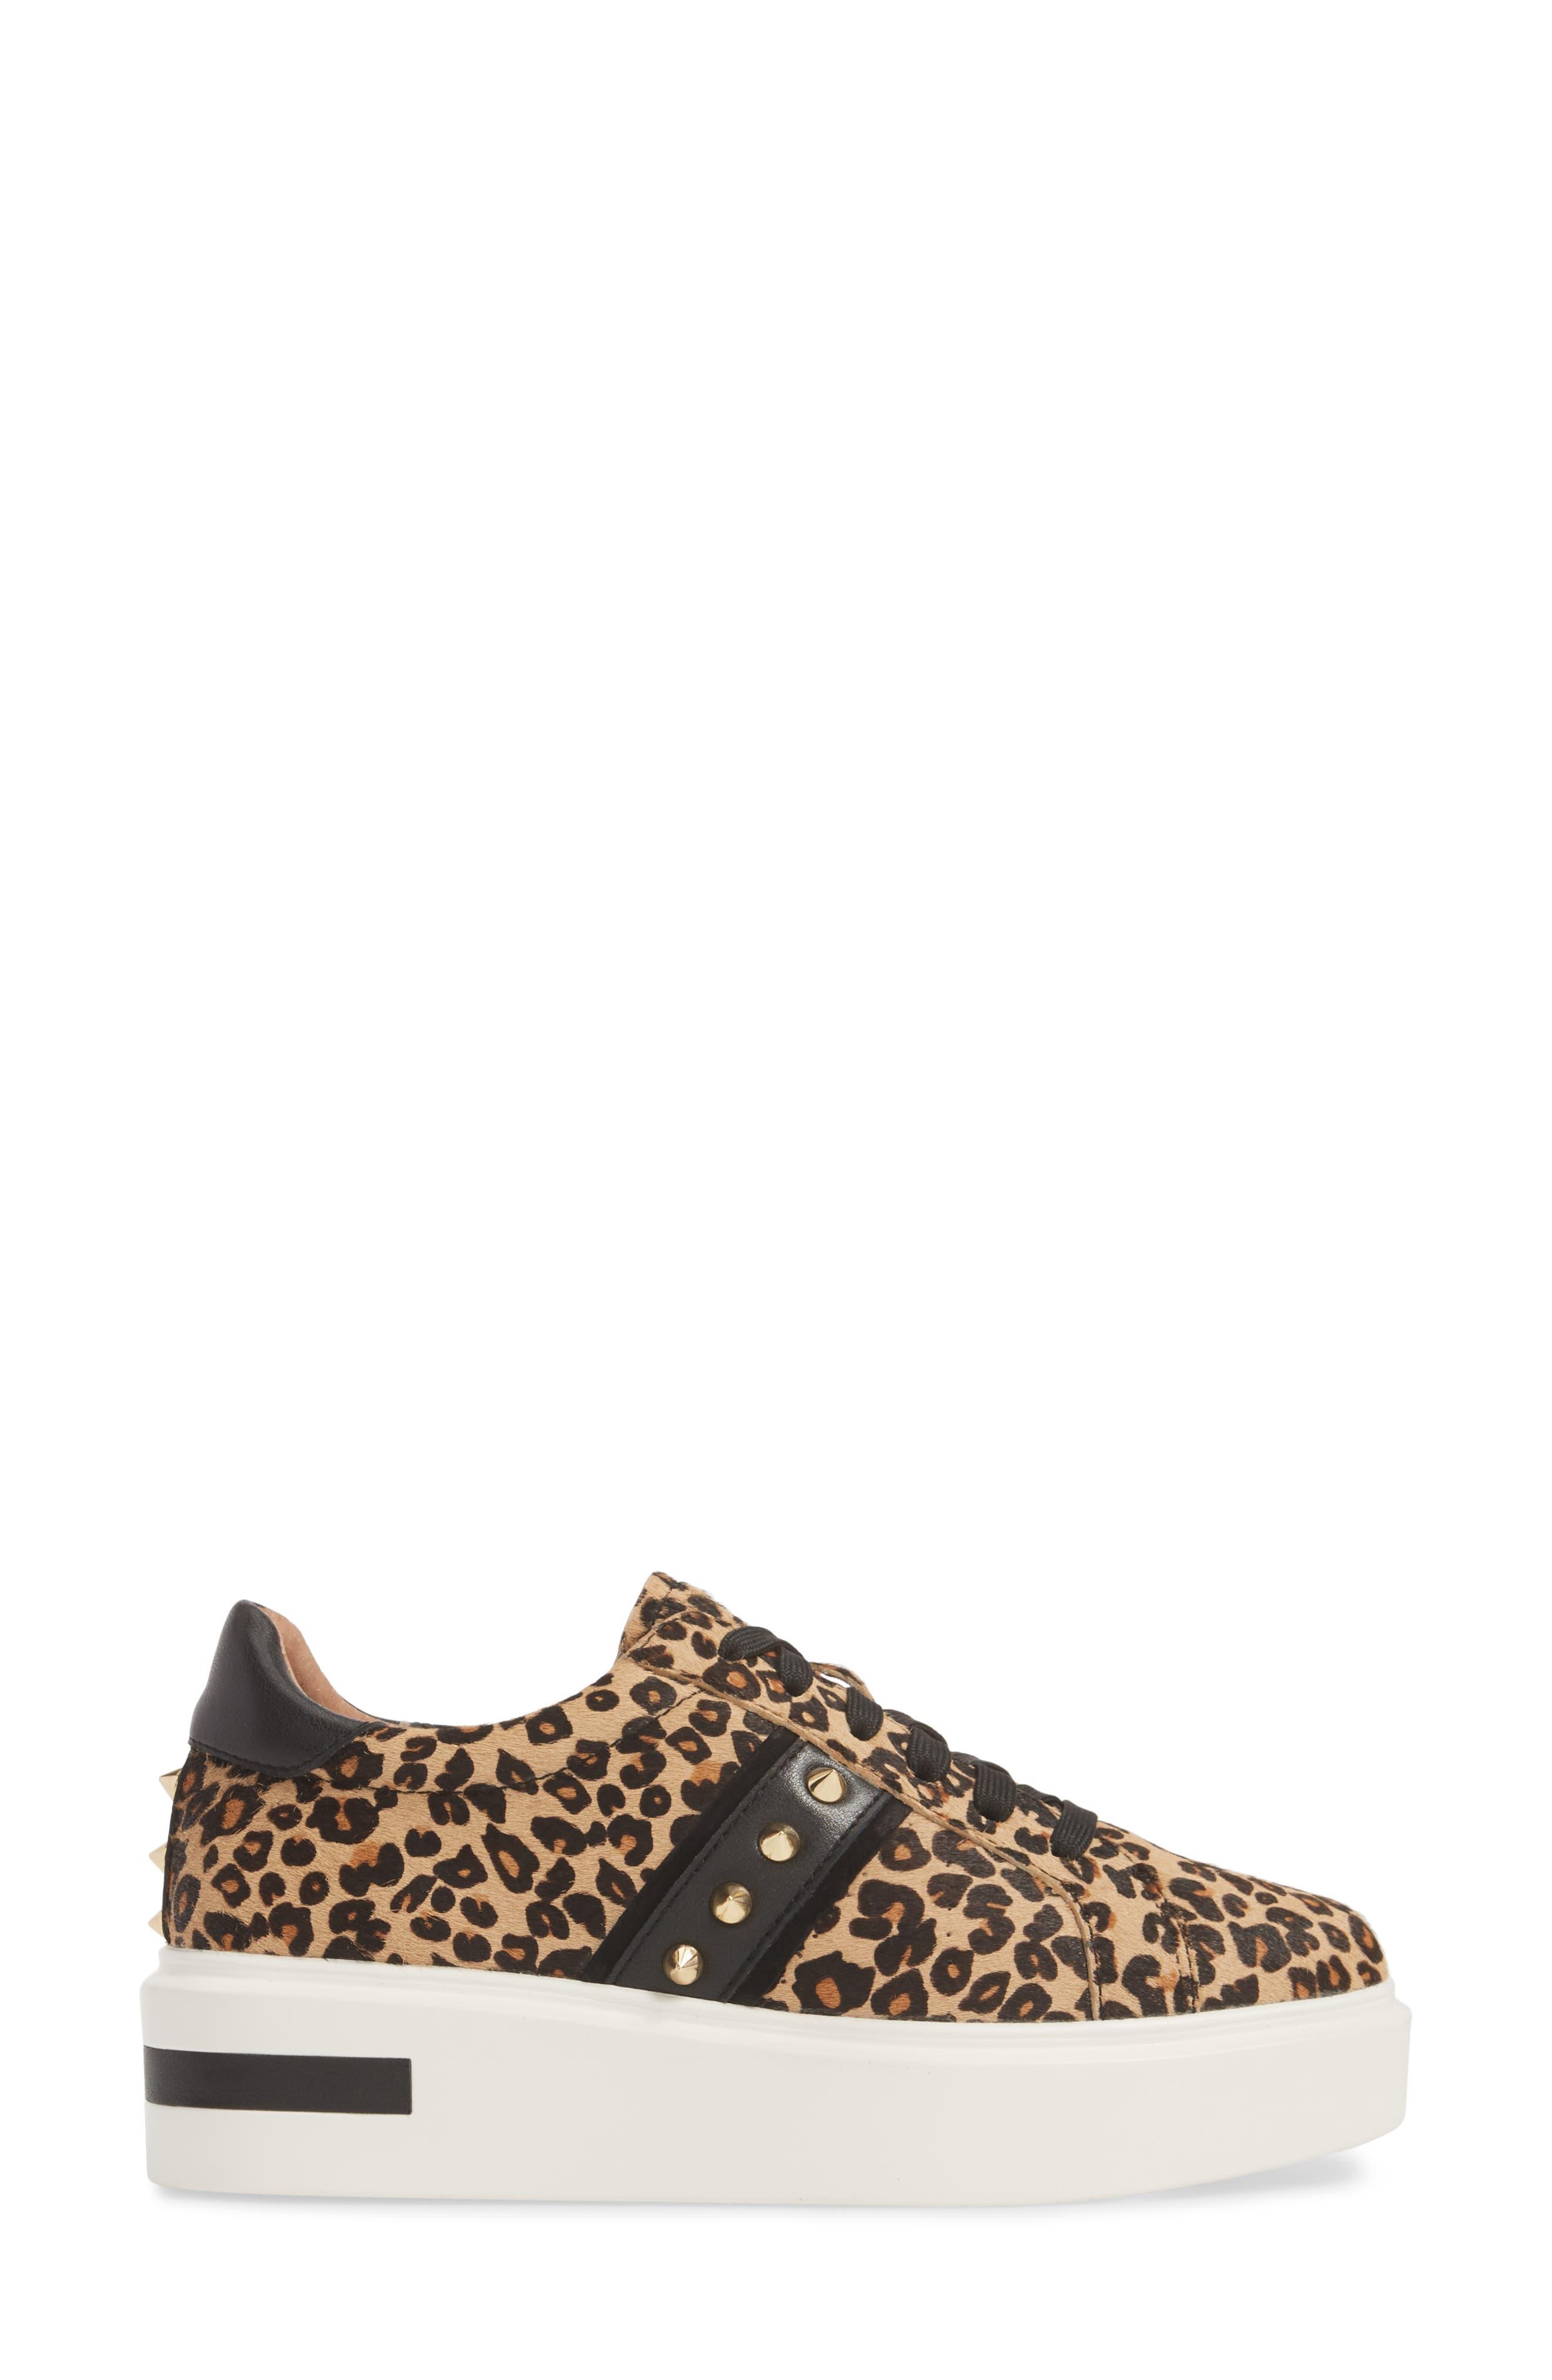 LINEA PAOLO,                             Knox II Platform Genuine Calf Hair Sneaker,                             Alternate thumbnail 3, color,                             LEOPARD PRINT HAIR CALF